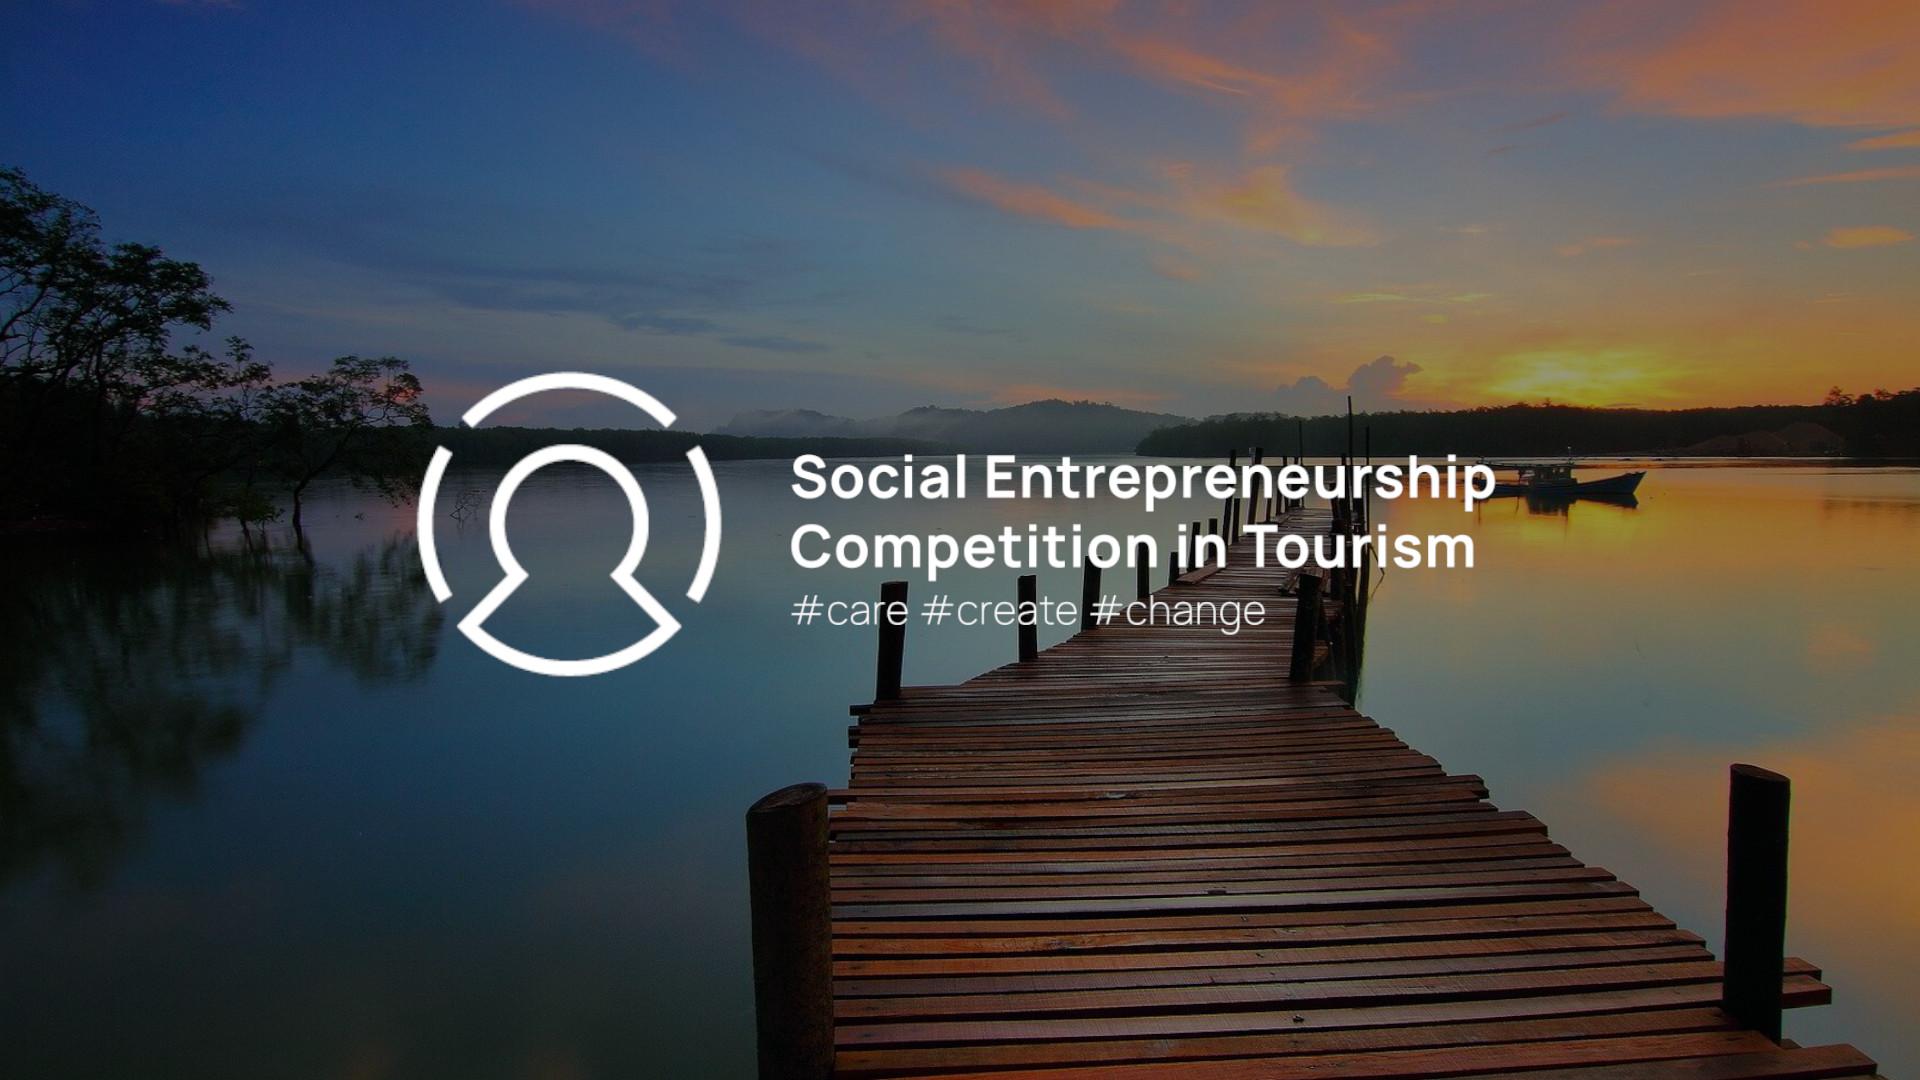 Social Entrepreneurship Competition in Tourism 2021